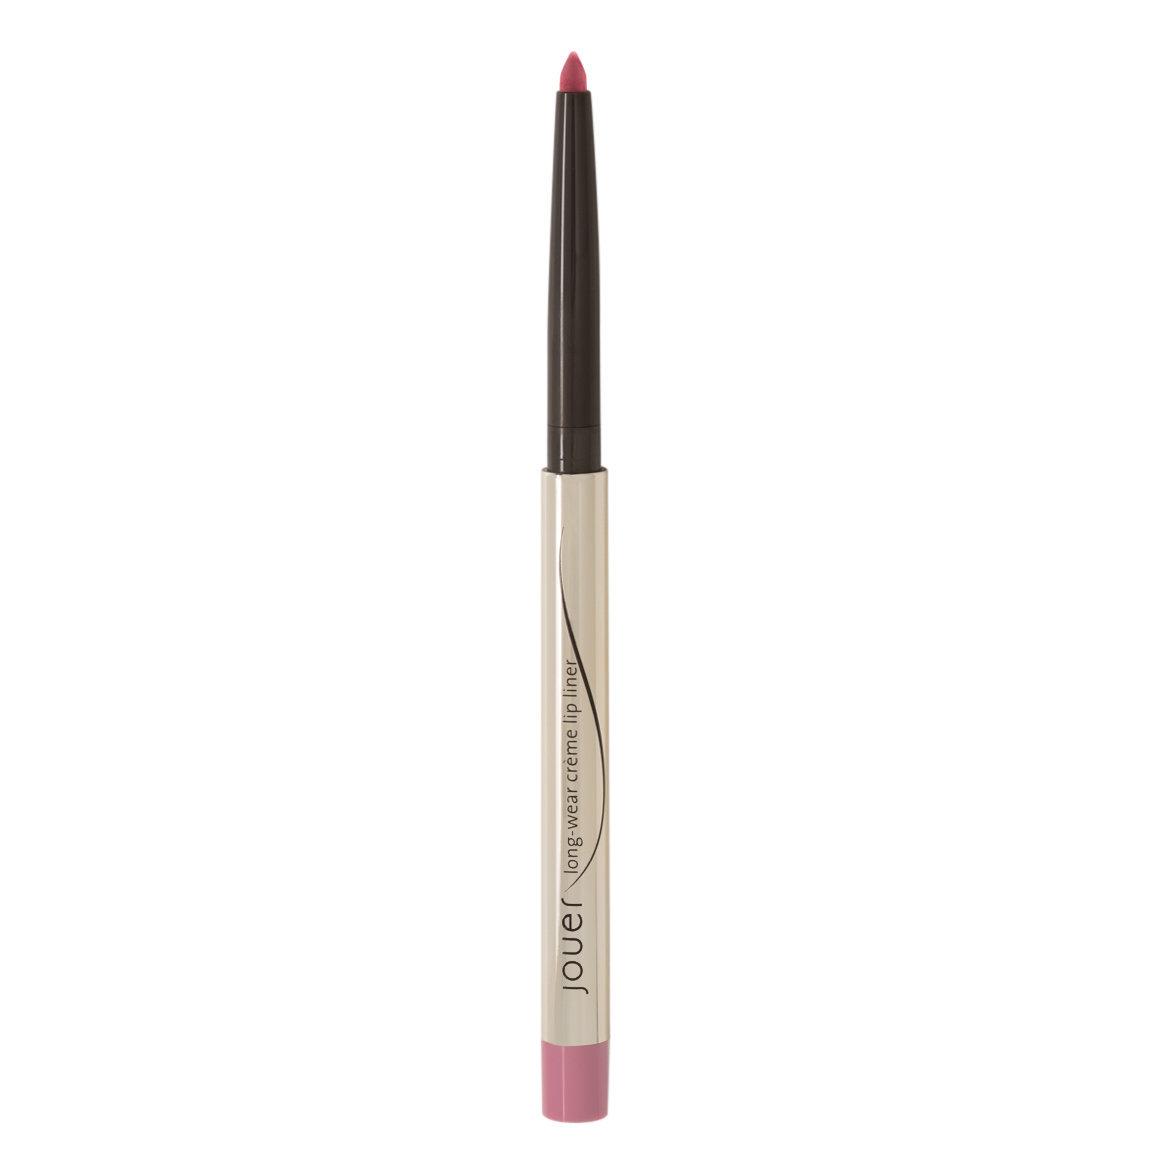 Jouer Cosmetics Long-Wear Crème Lip-Liner Petal